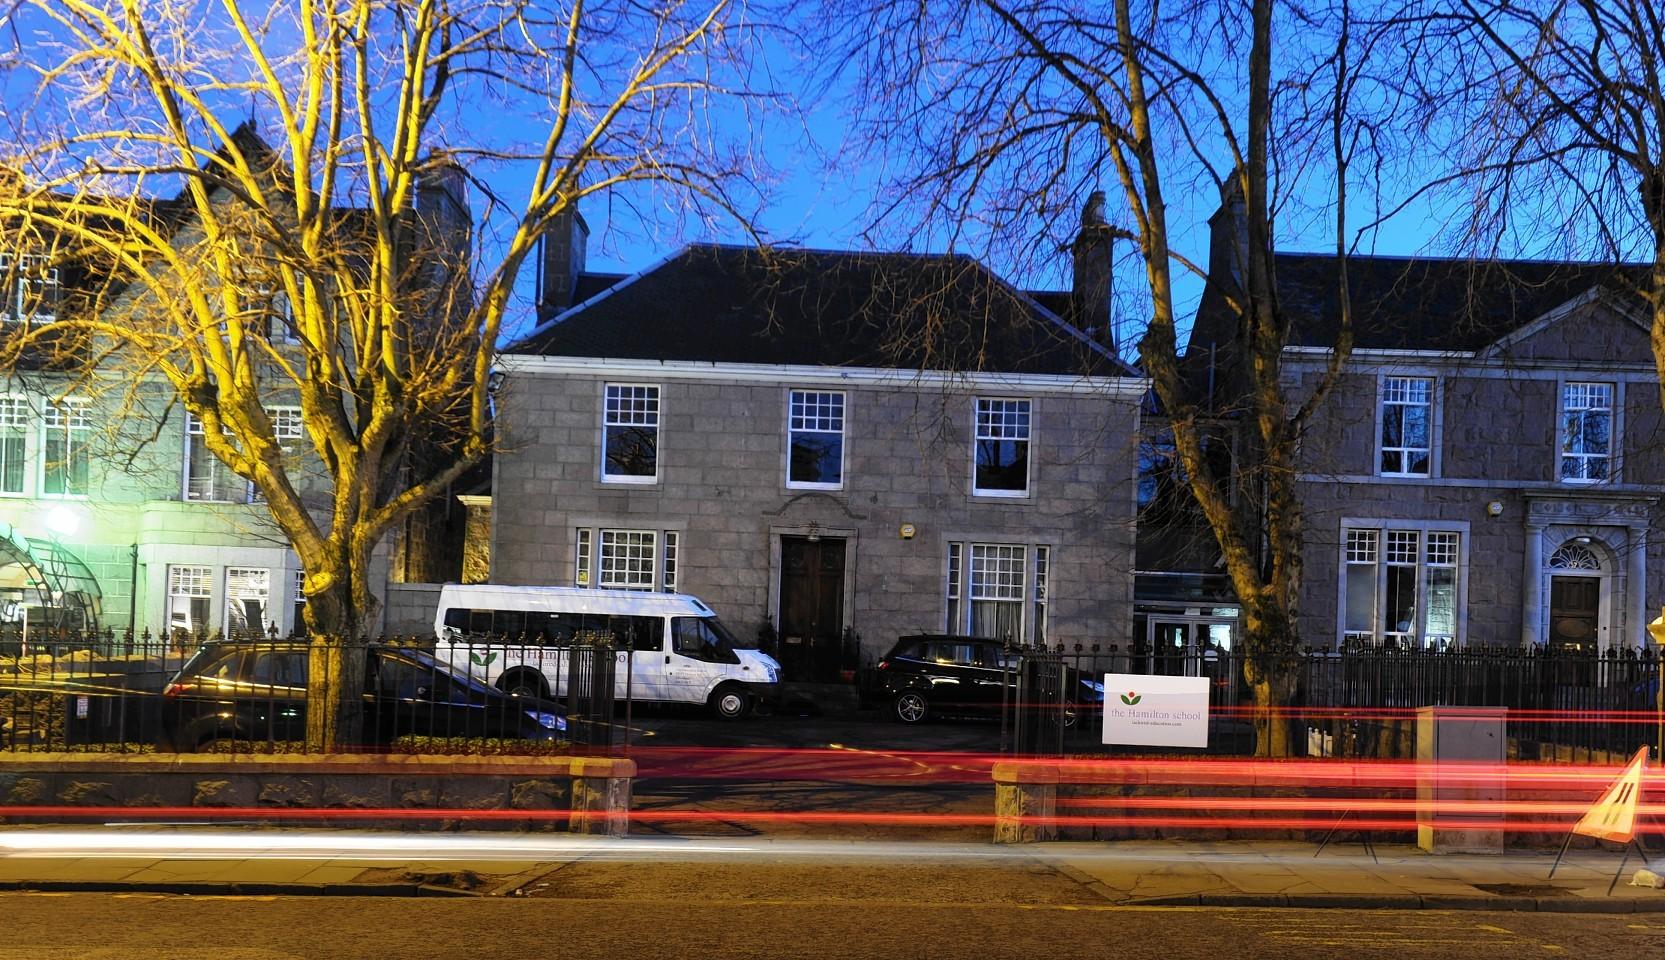 Hamilton School, Aberdeen